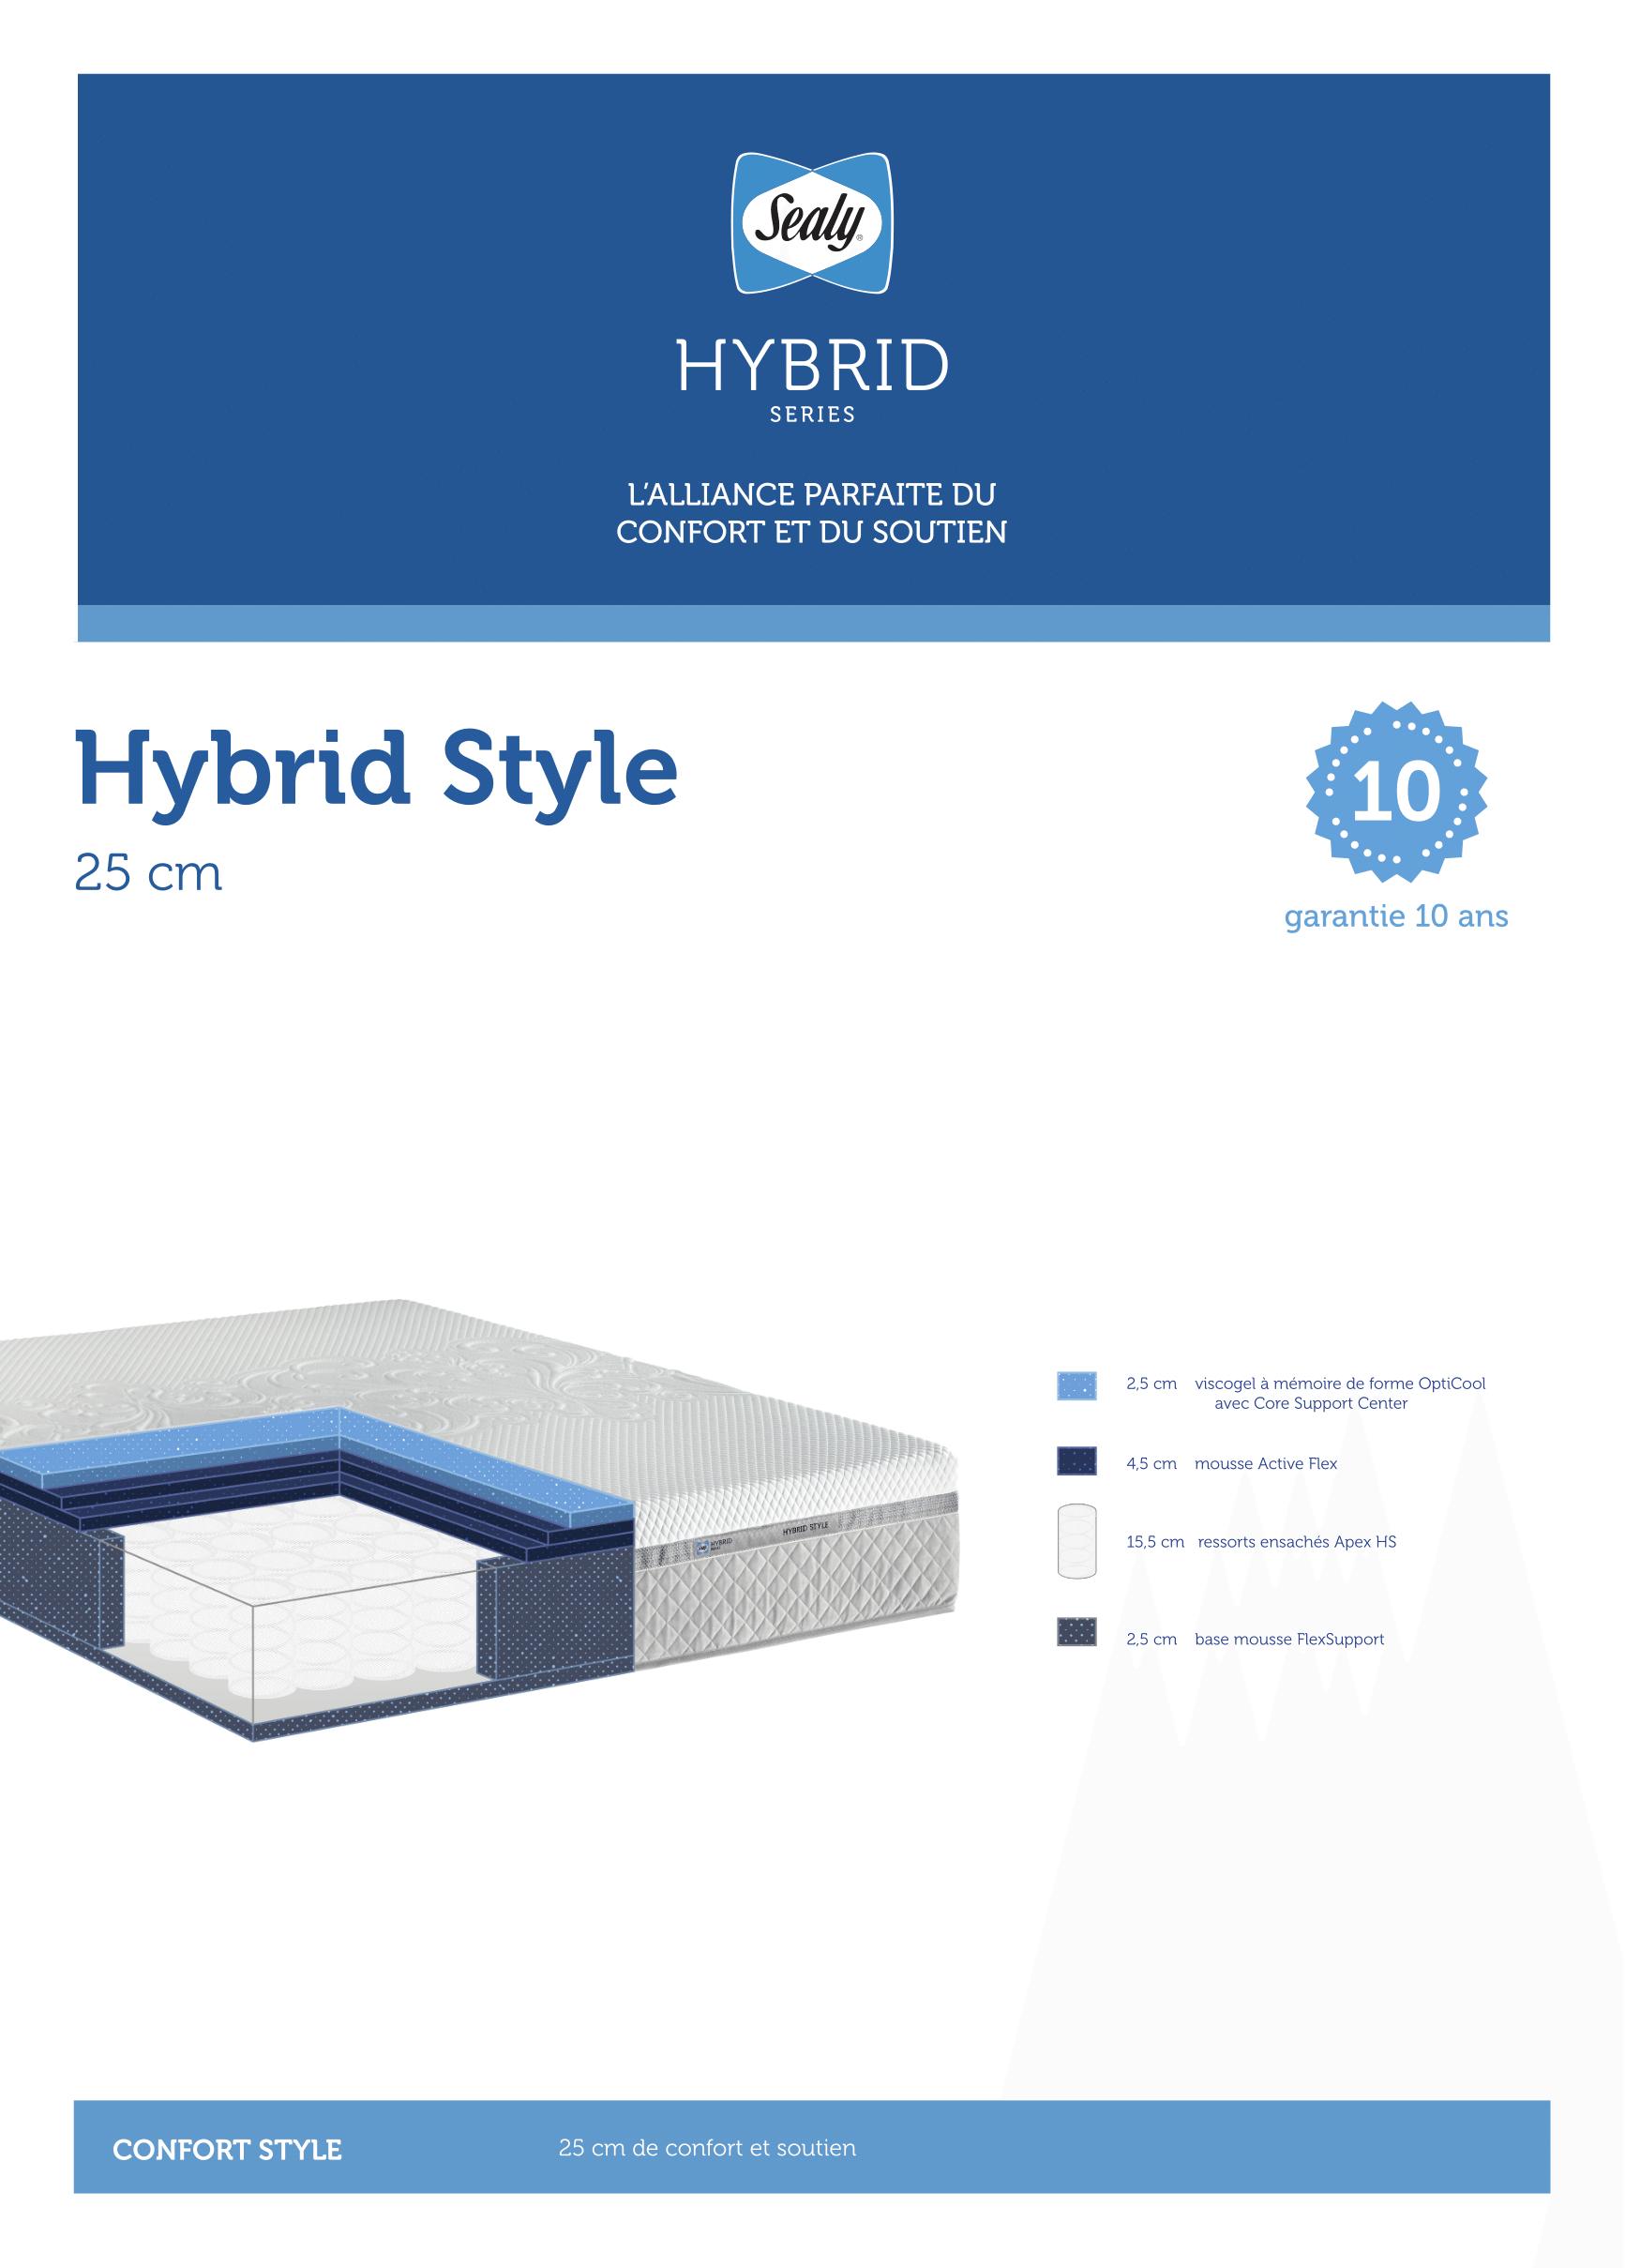 SEALY HYBRID STYLE